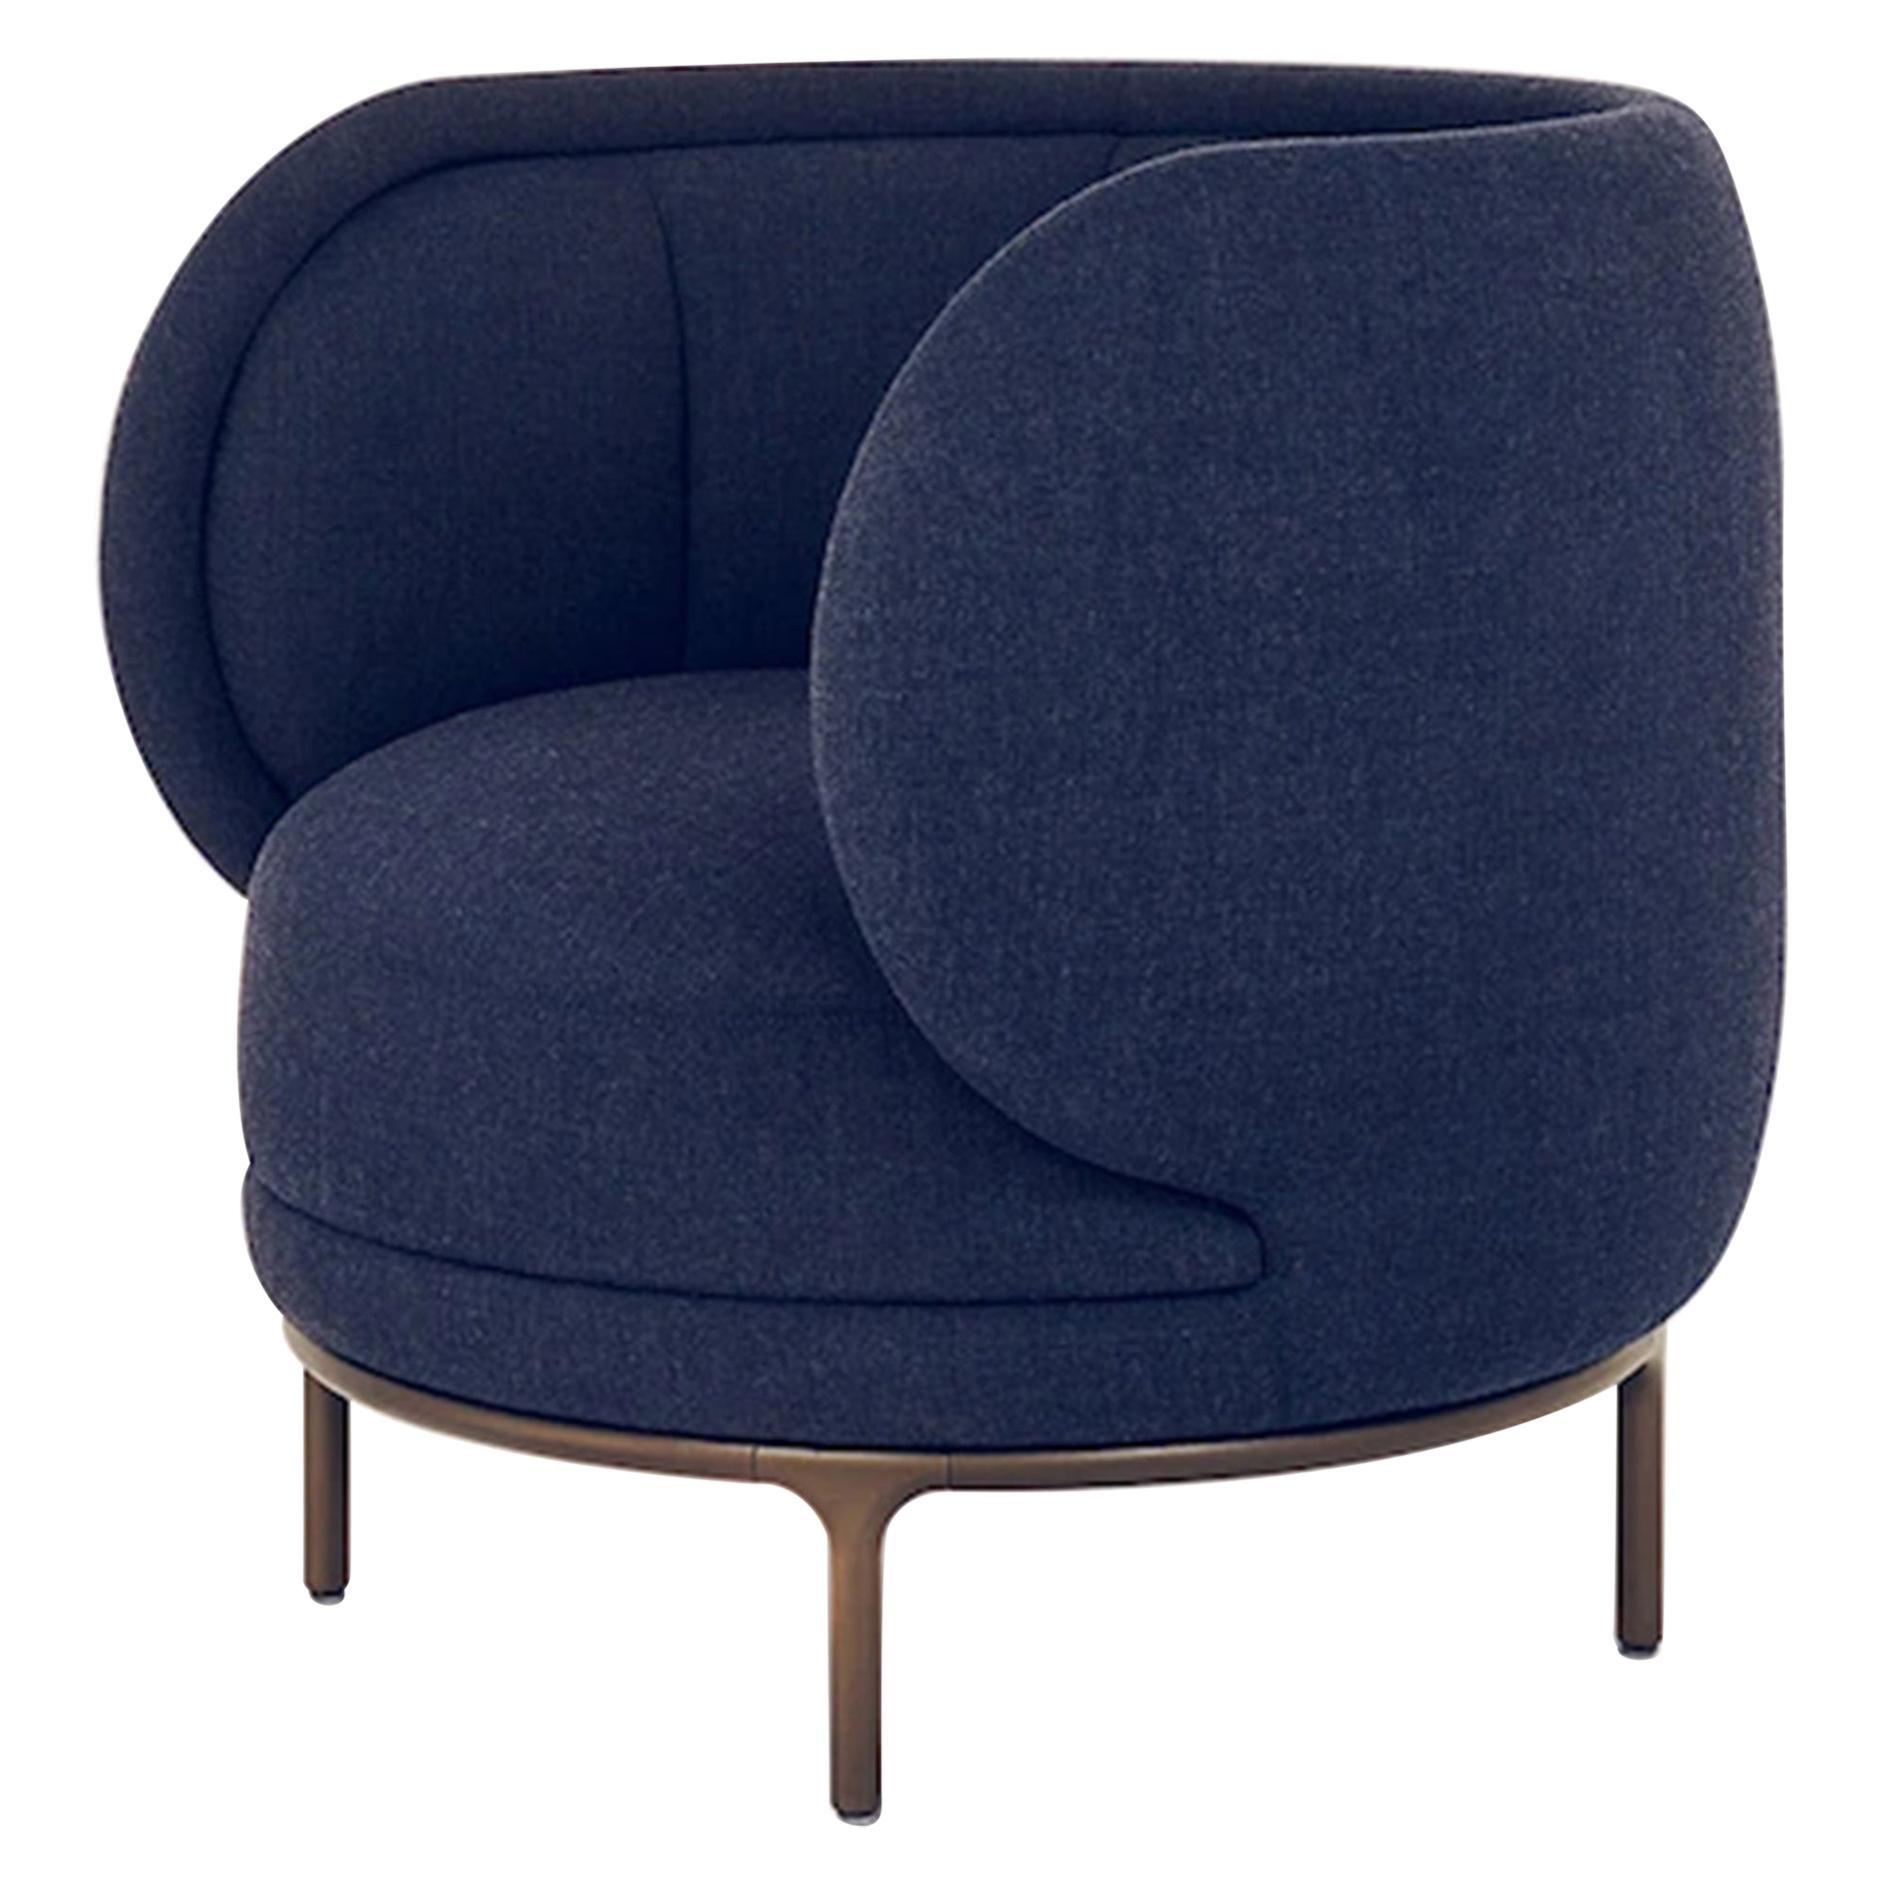 Wittmann Vuelta Swivel Lounge Armchair Designed by Jaime Hayon